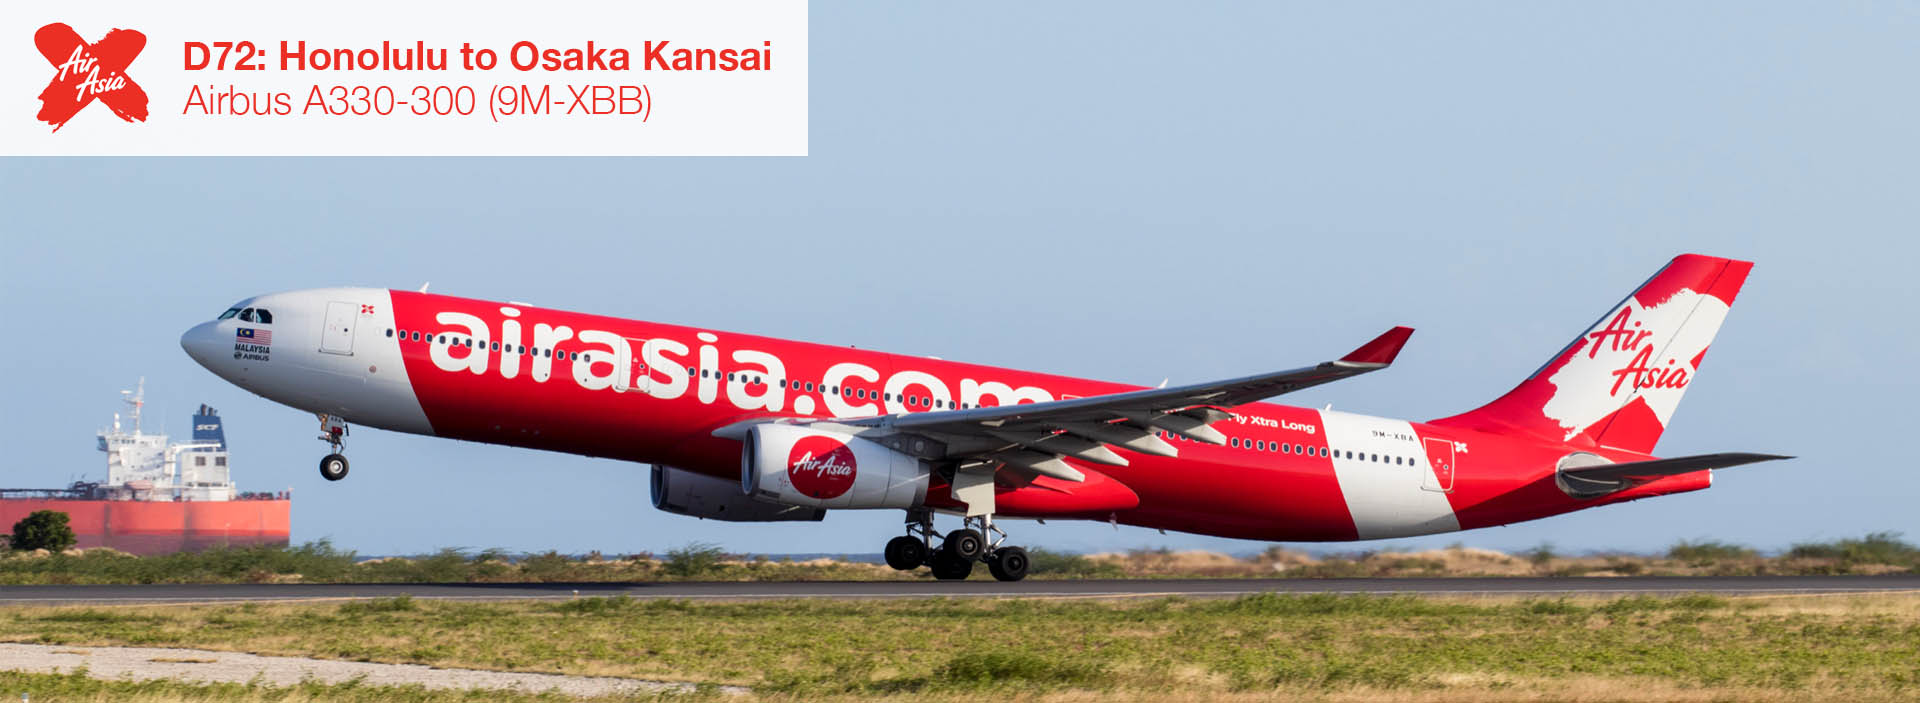 AirAsia X A330-300 Economy Class Honolulu to Osaka Kansai Flight Review